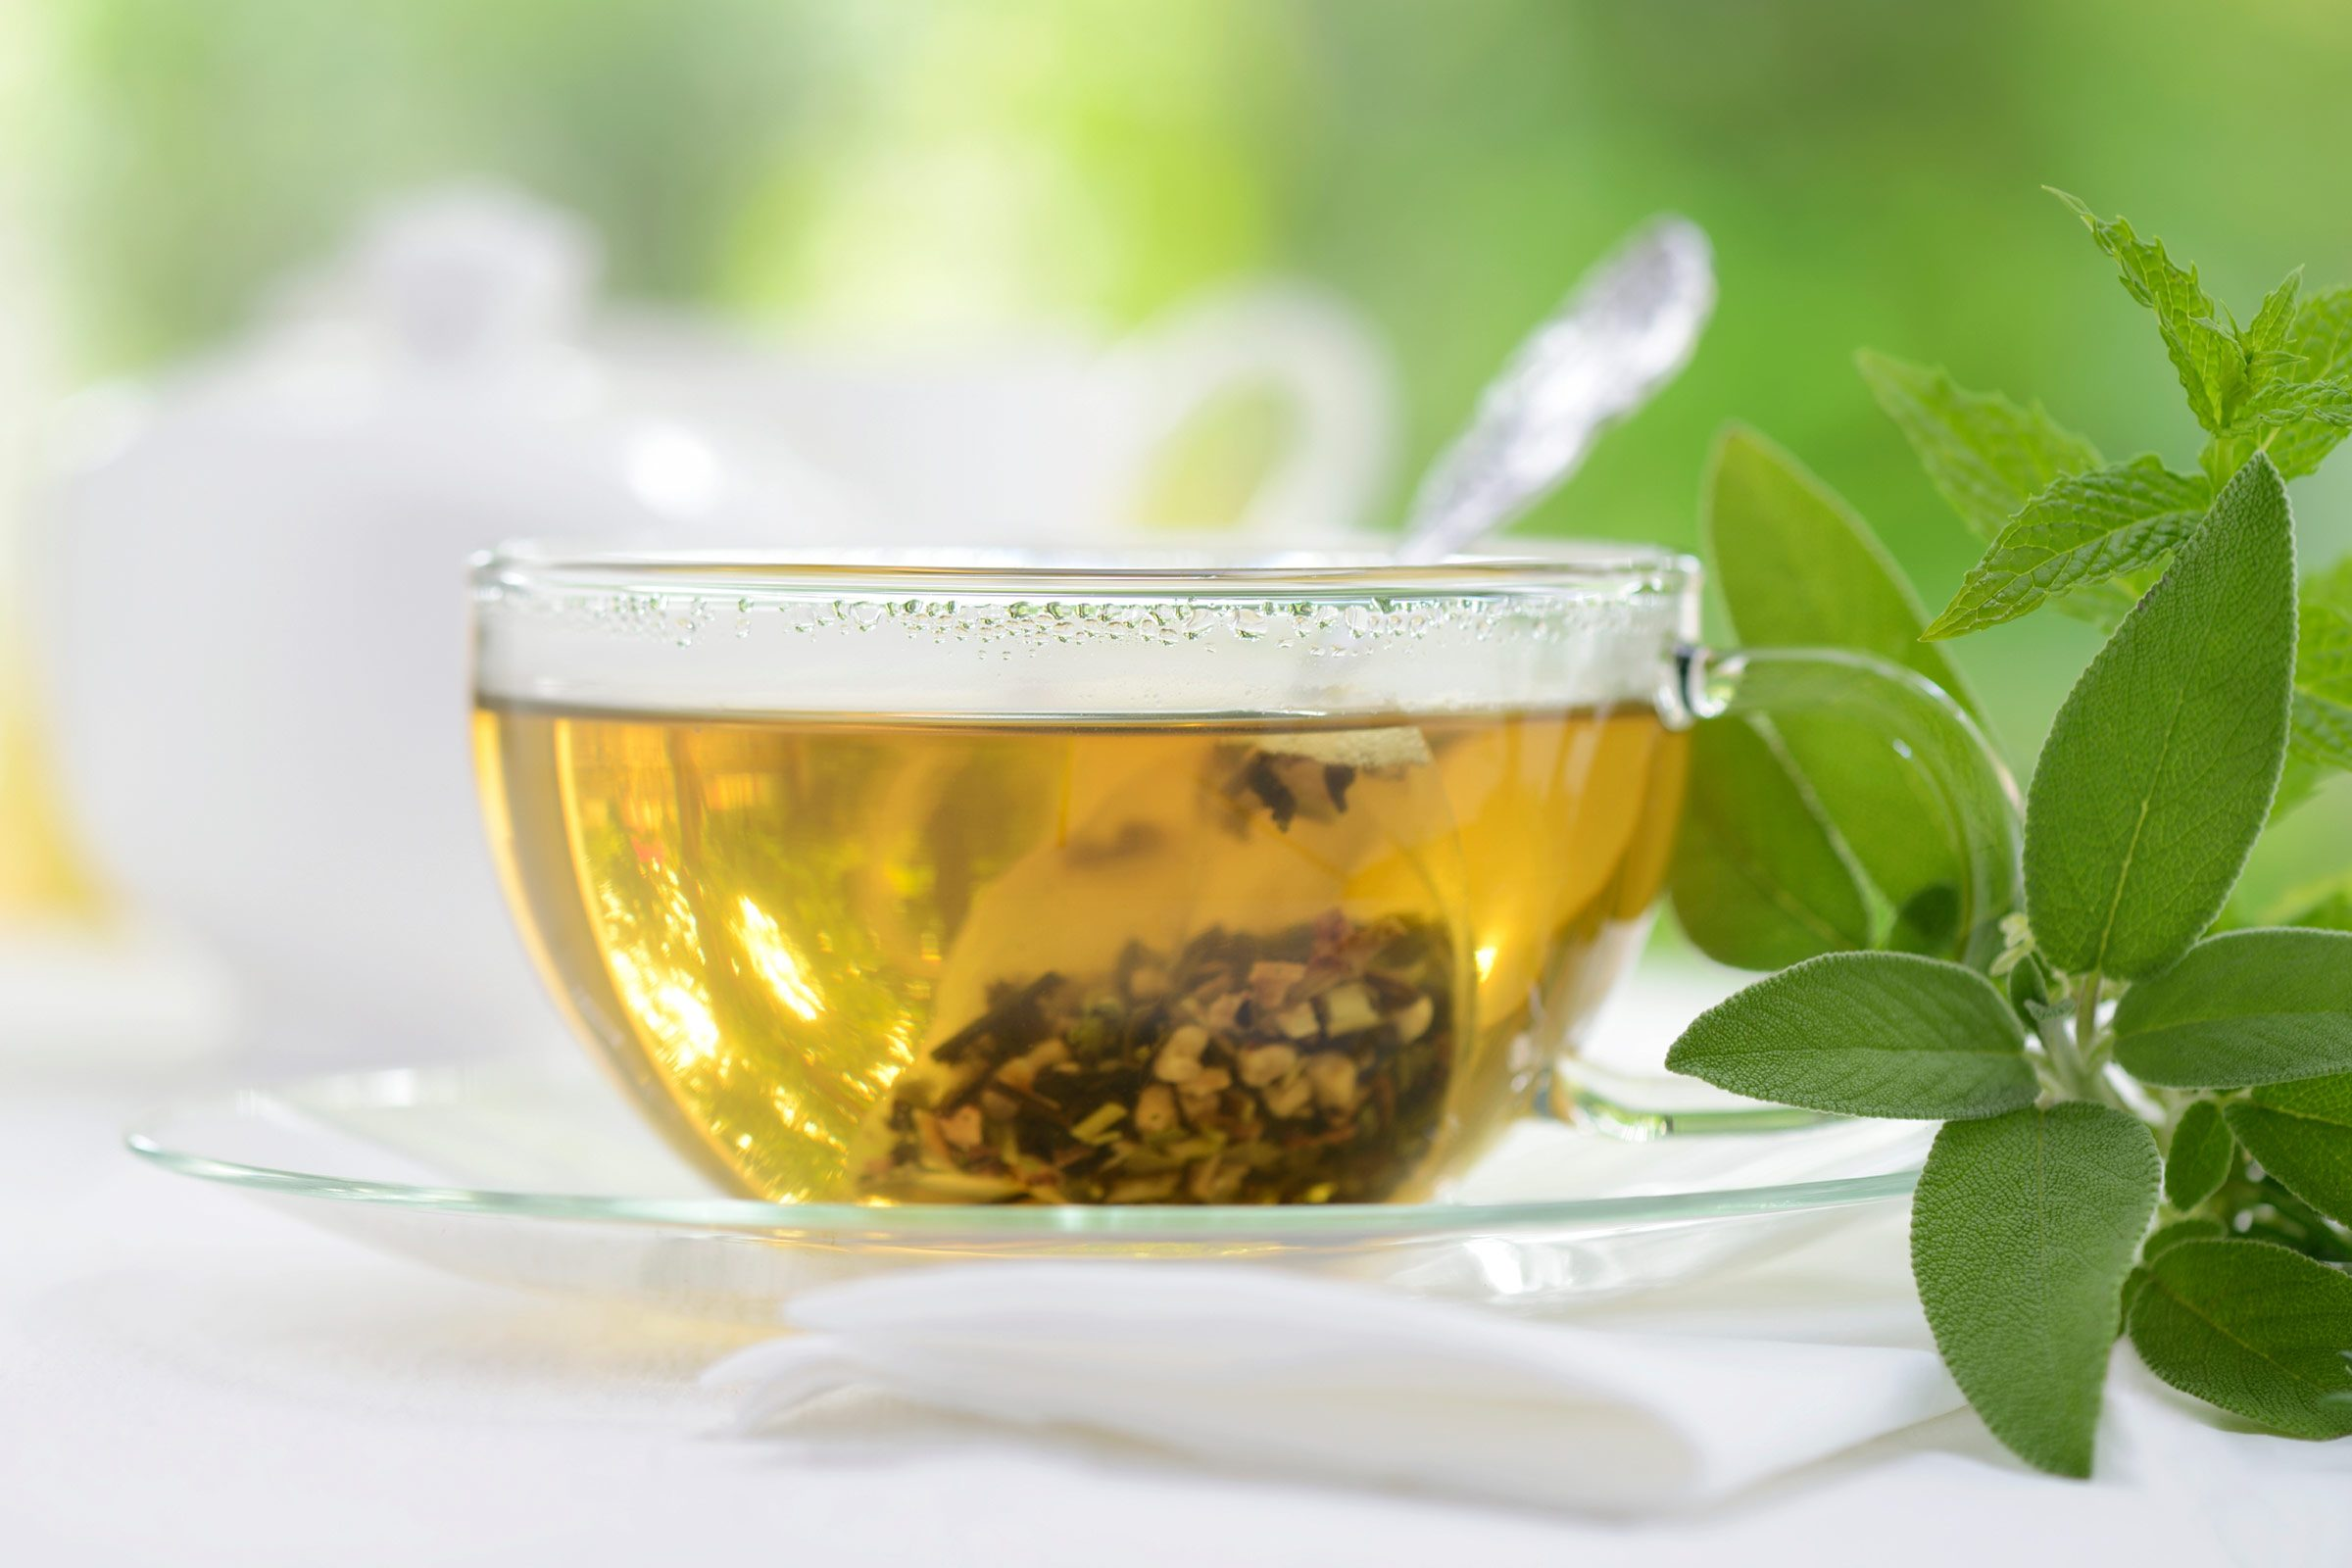 Sore throat remedy: Green tea